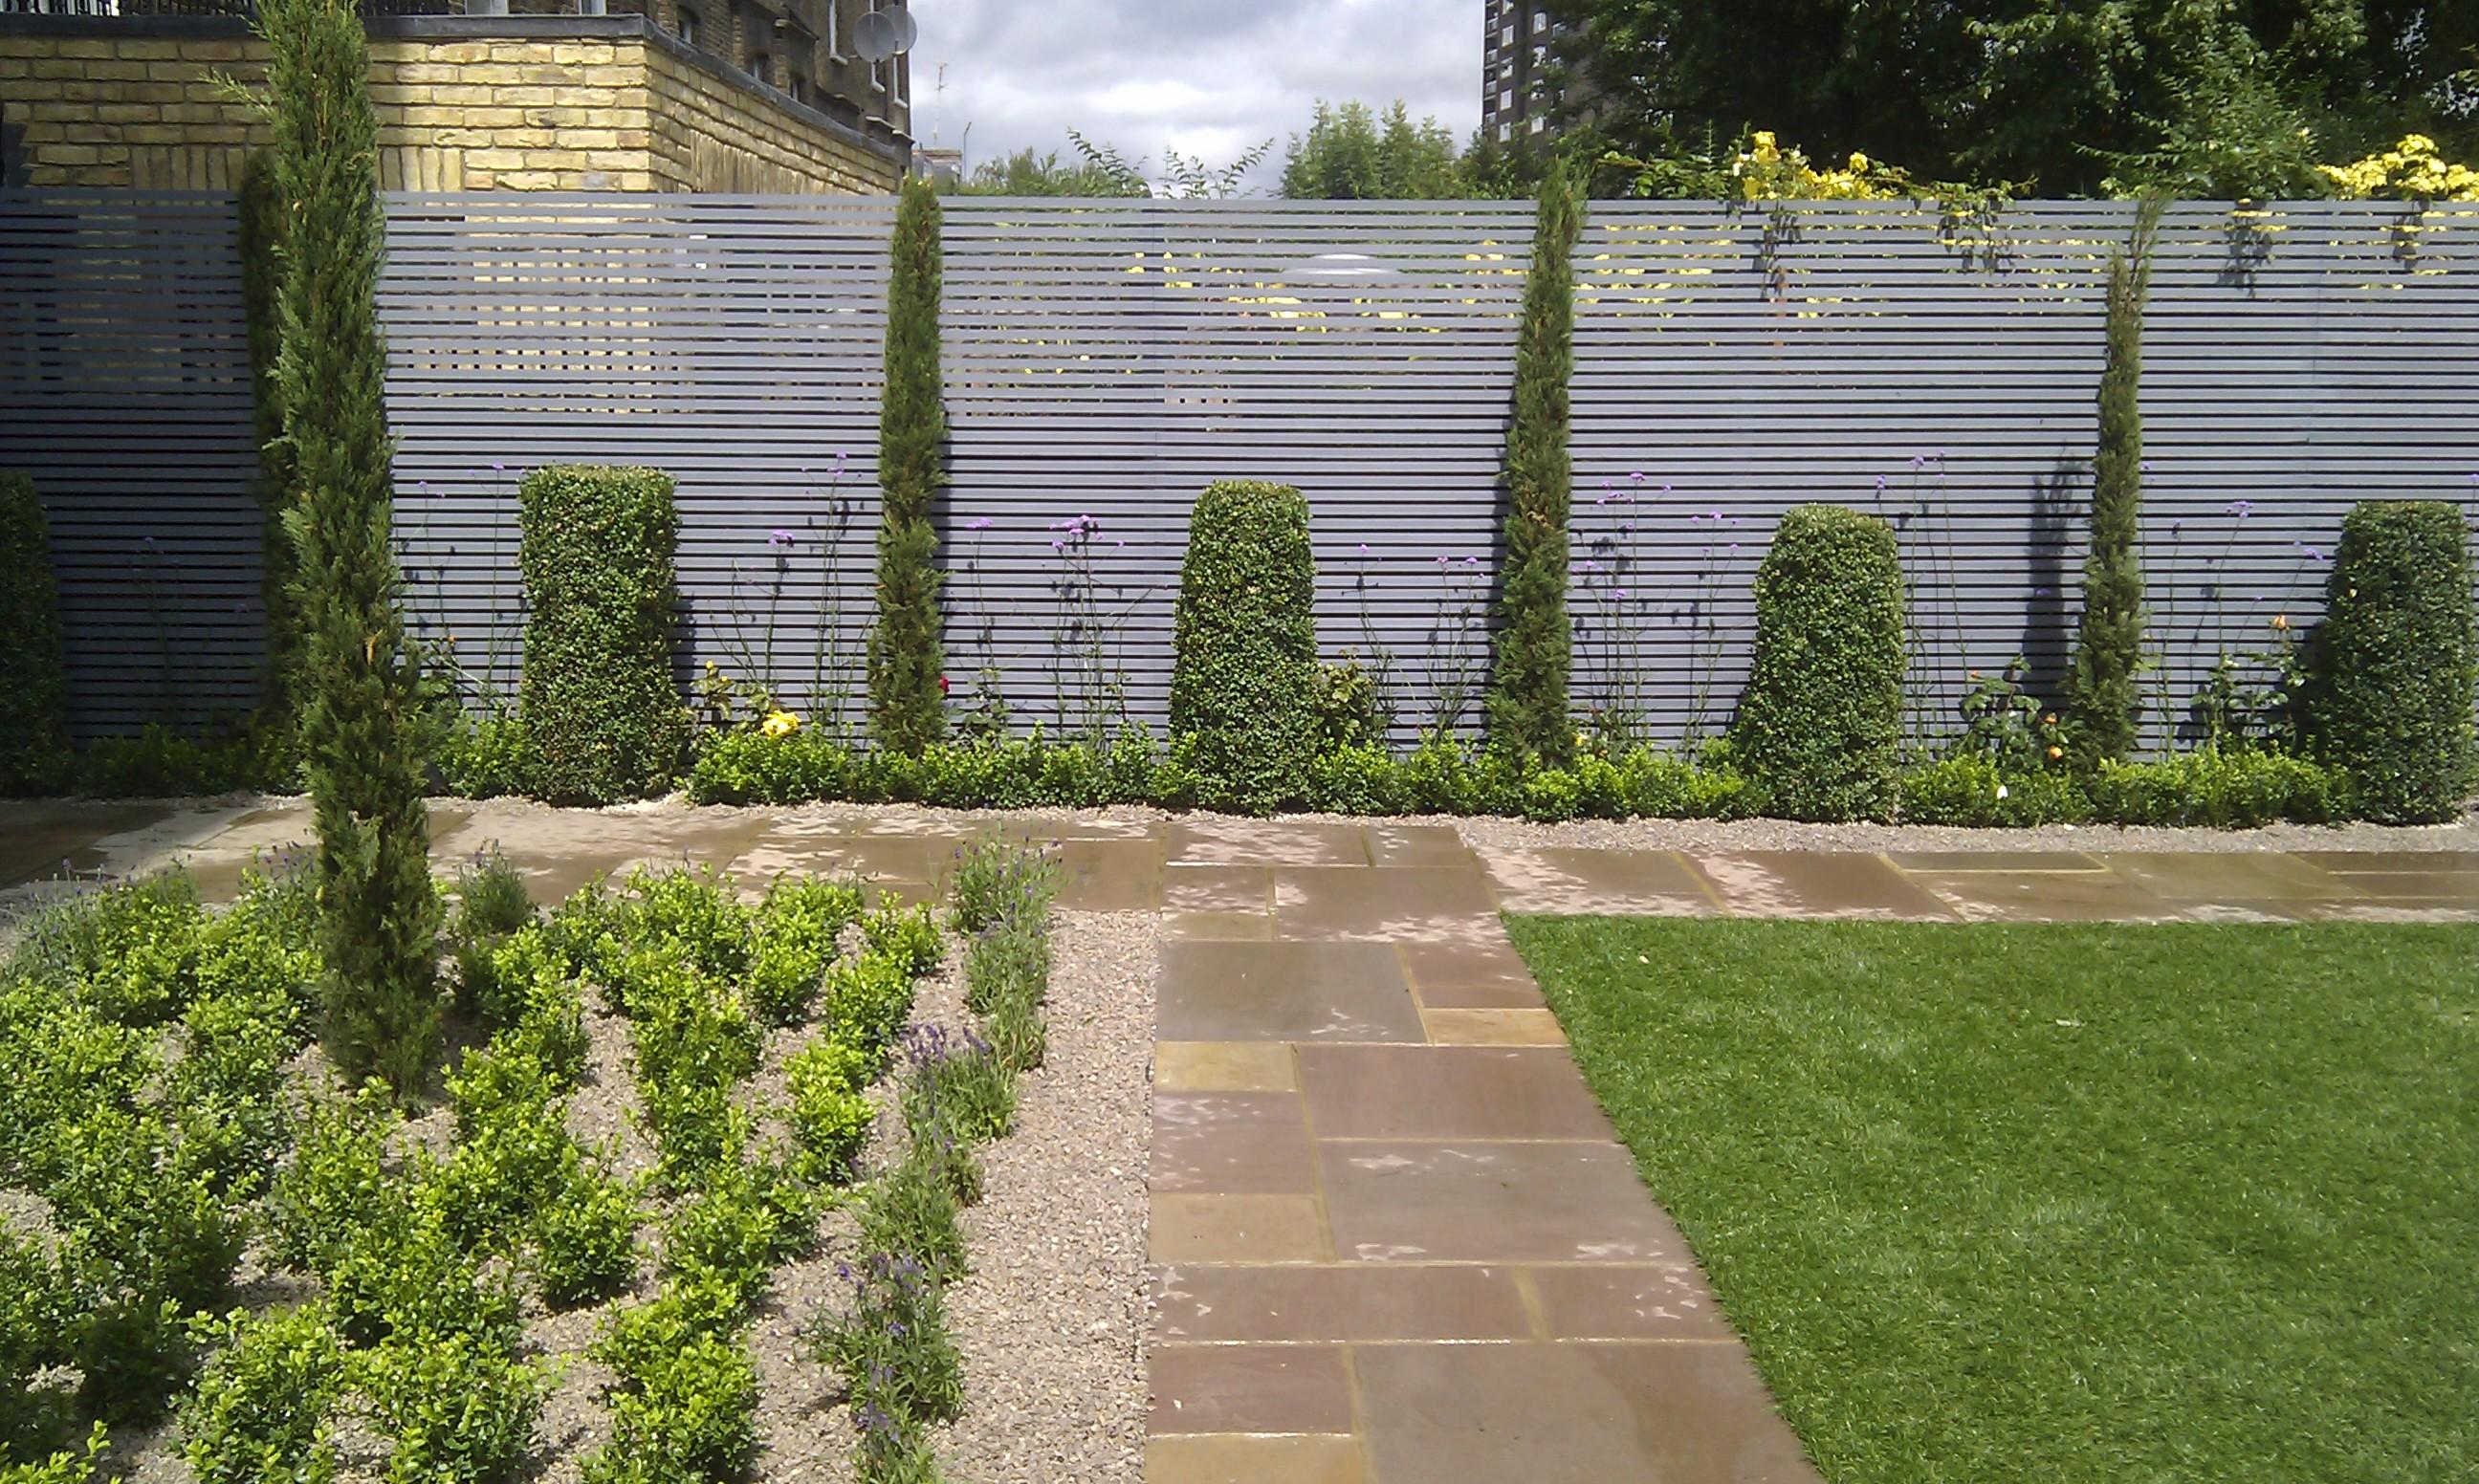 modern garden design london slatted grey privacy screen sandstone paving easy grass balau hardwood decking (4)